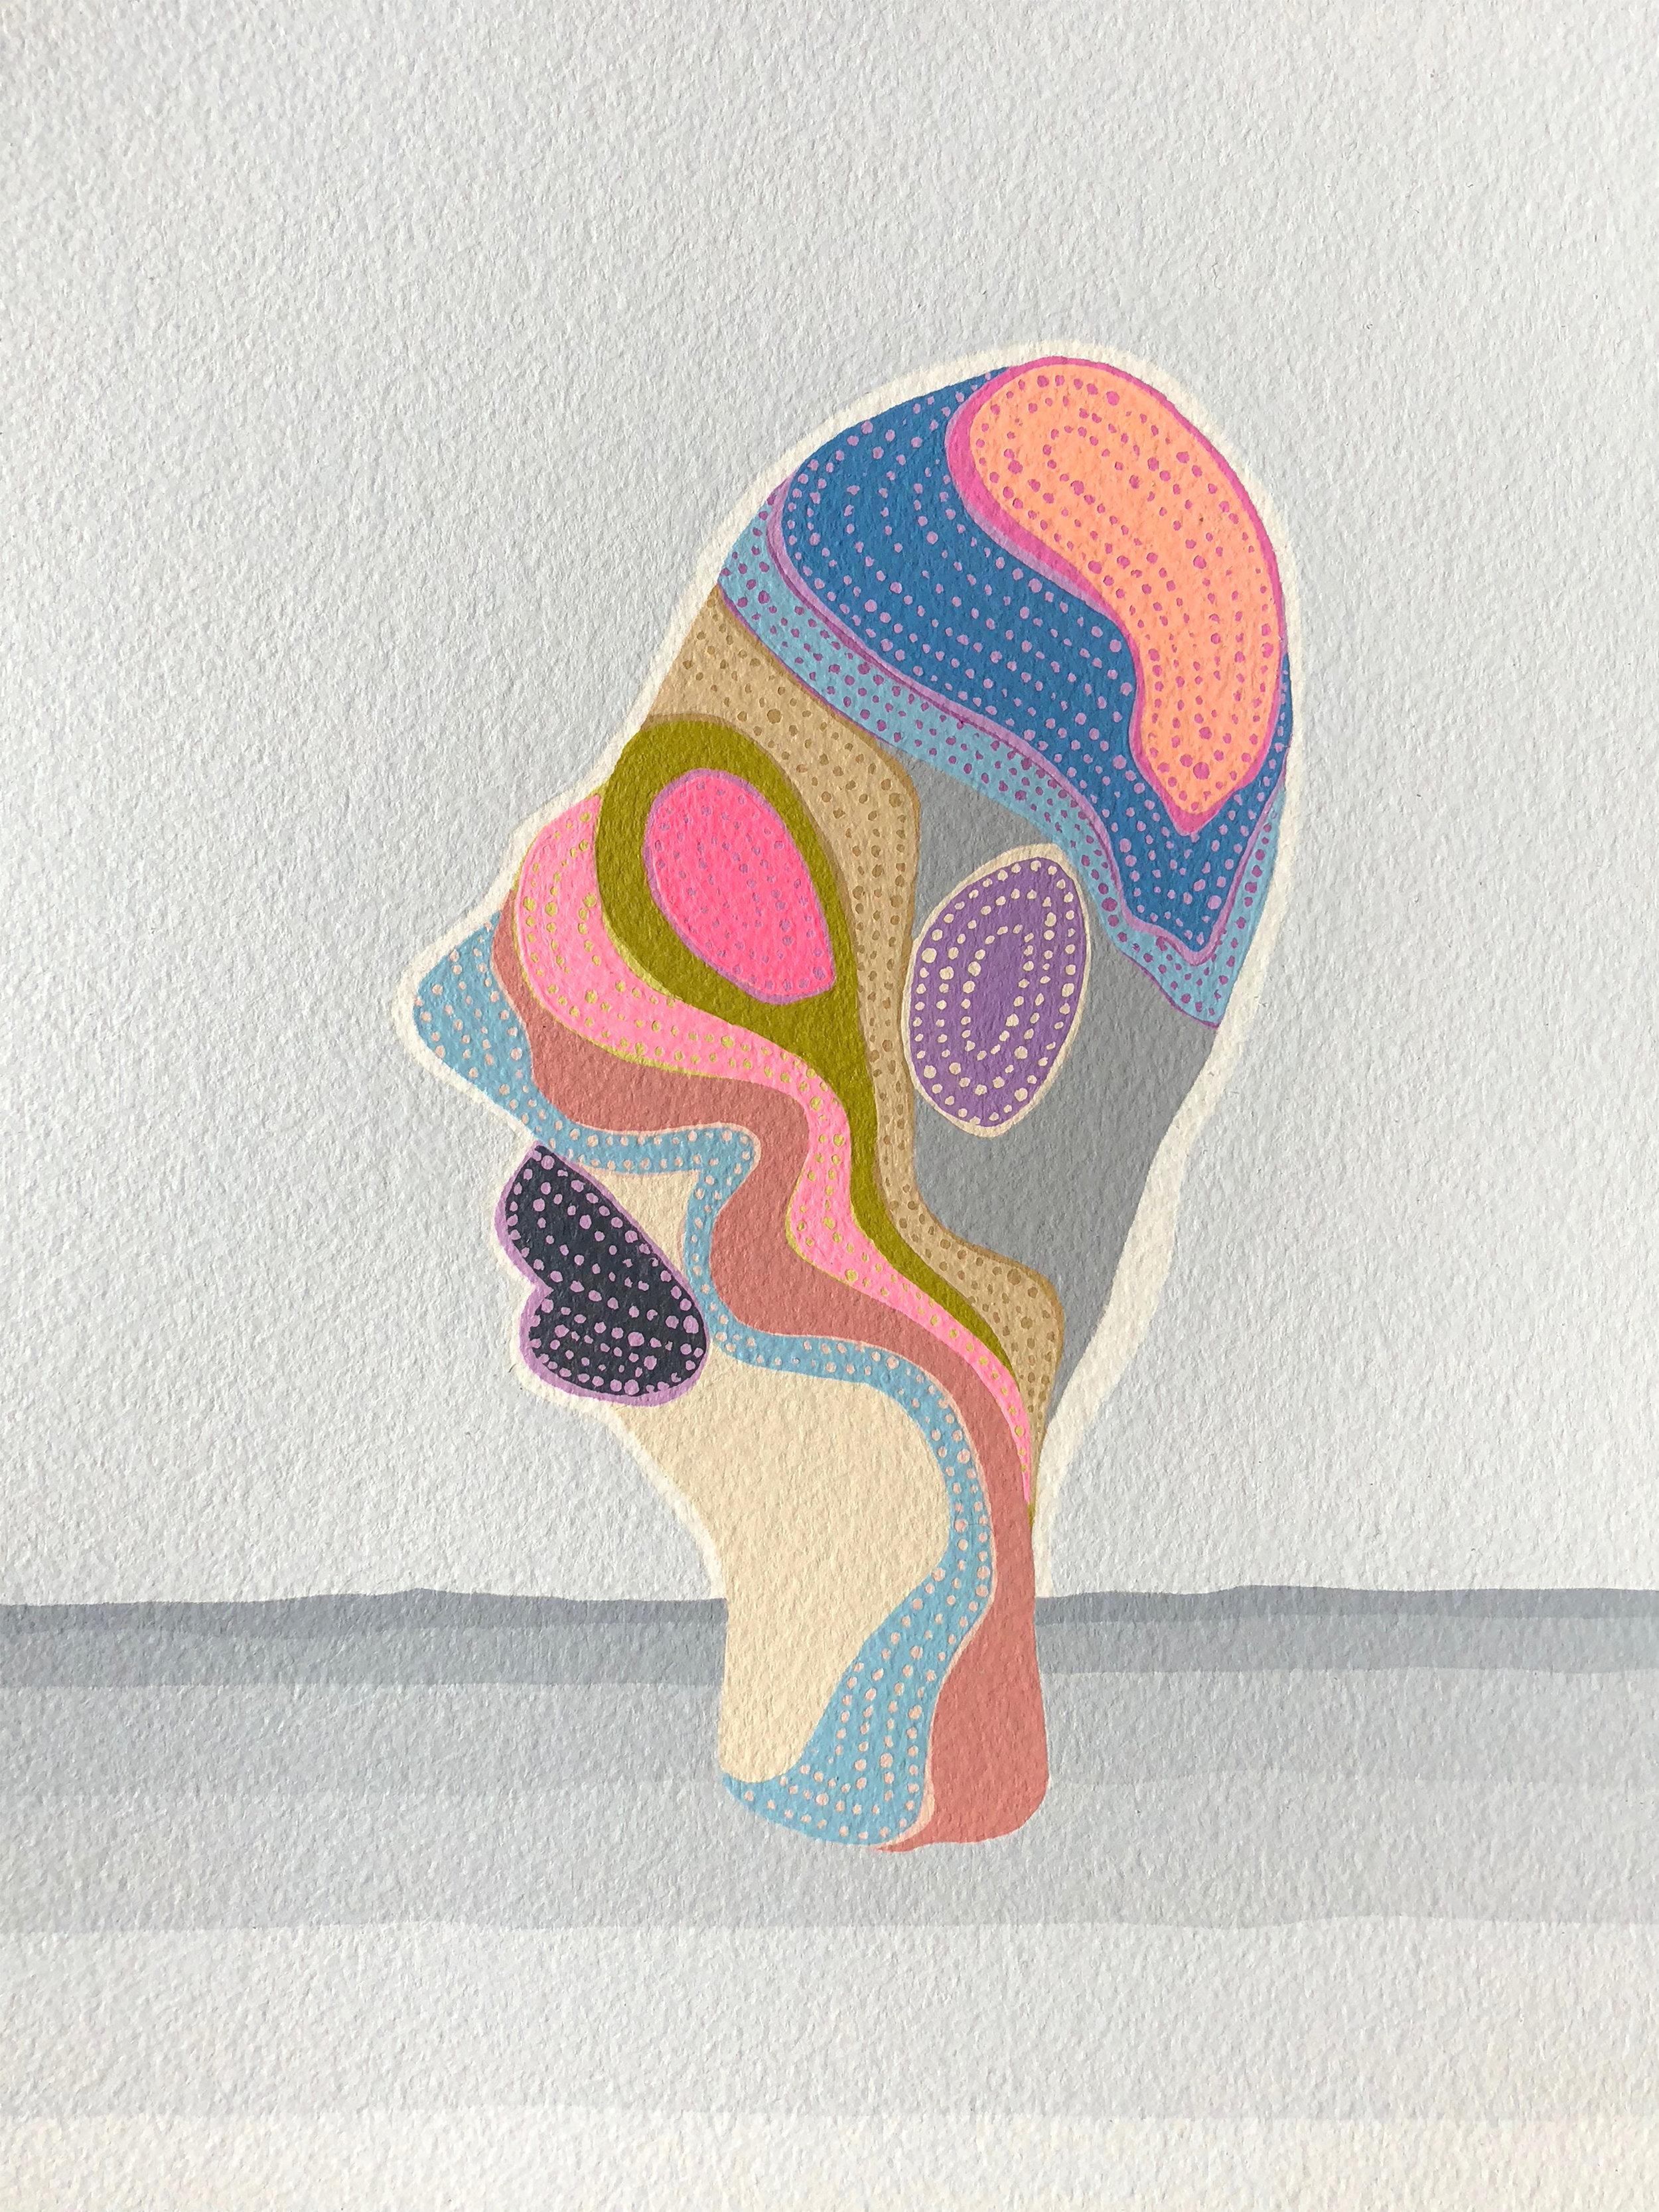 hyper colour head I